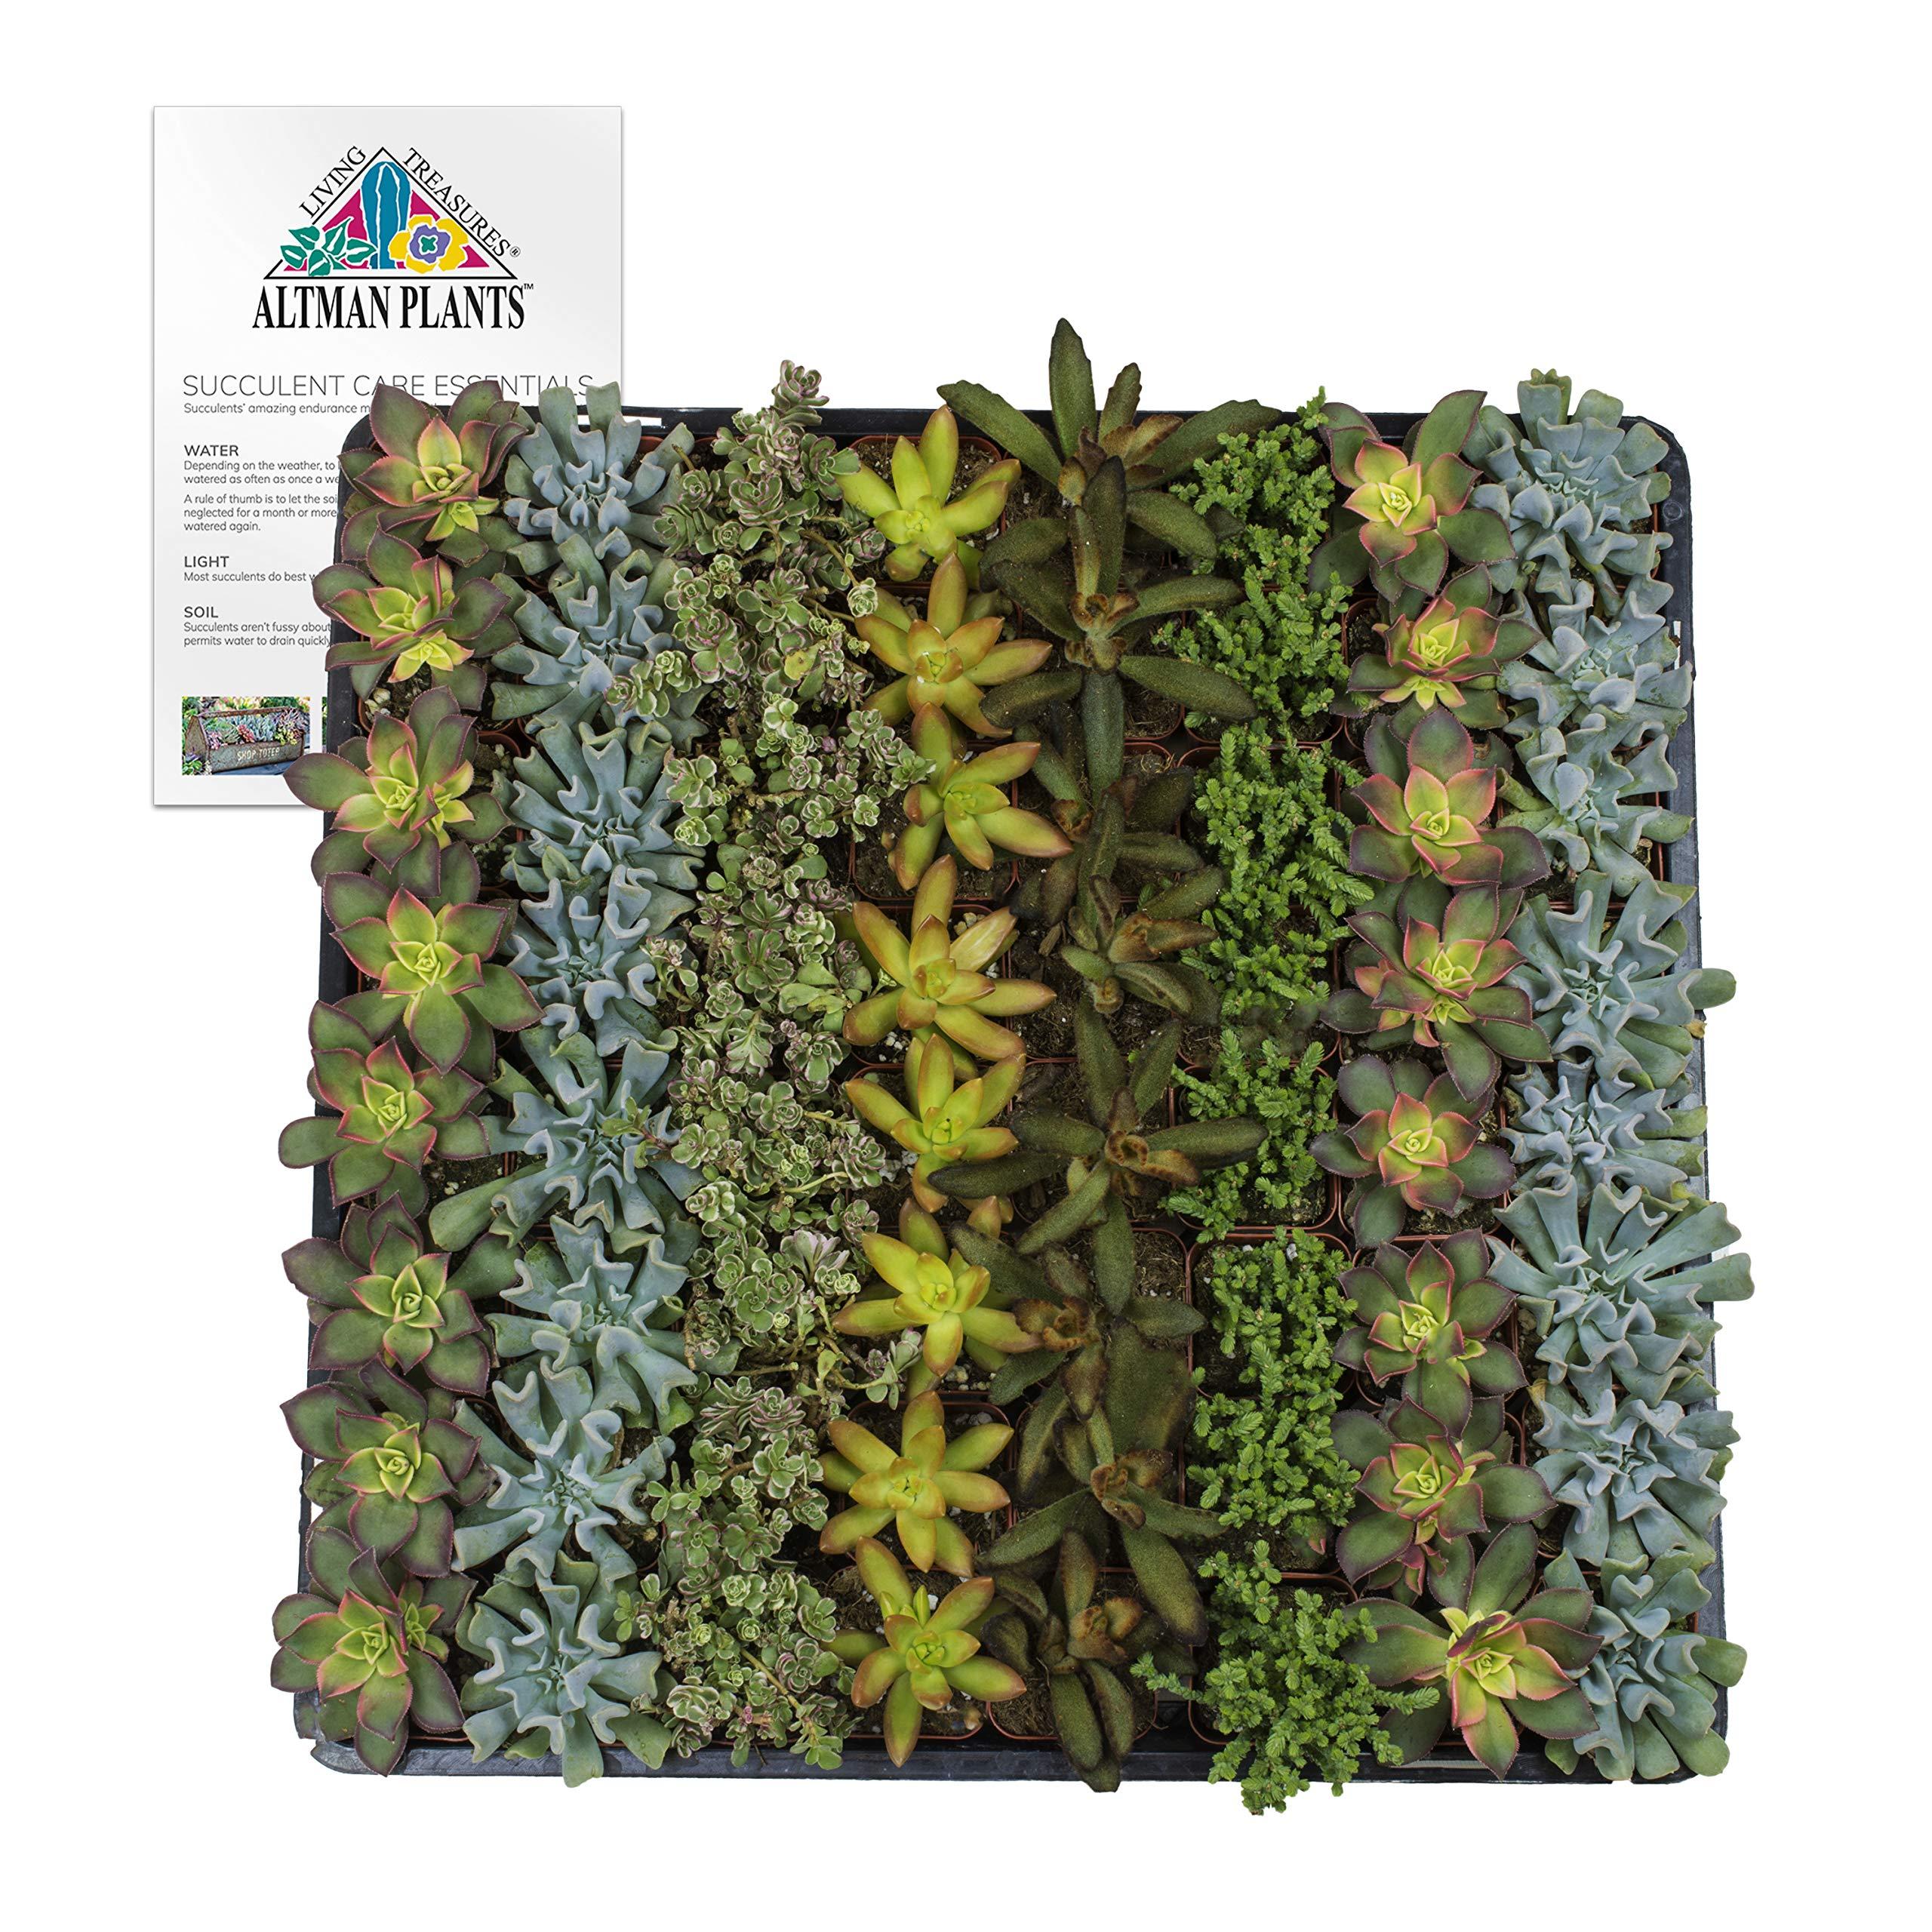 Altman Plants Assorted Succulents Wedding Party Favors Dish Gardens Starter Kit 2'' 64 Pack